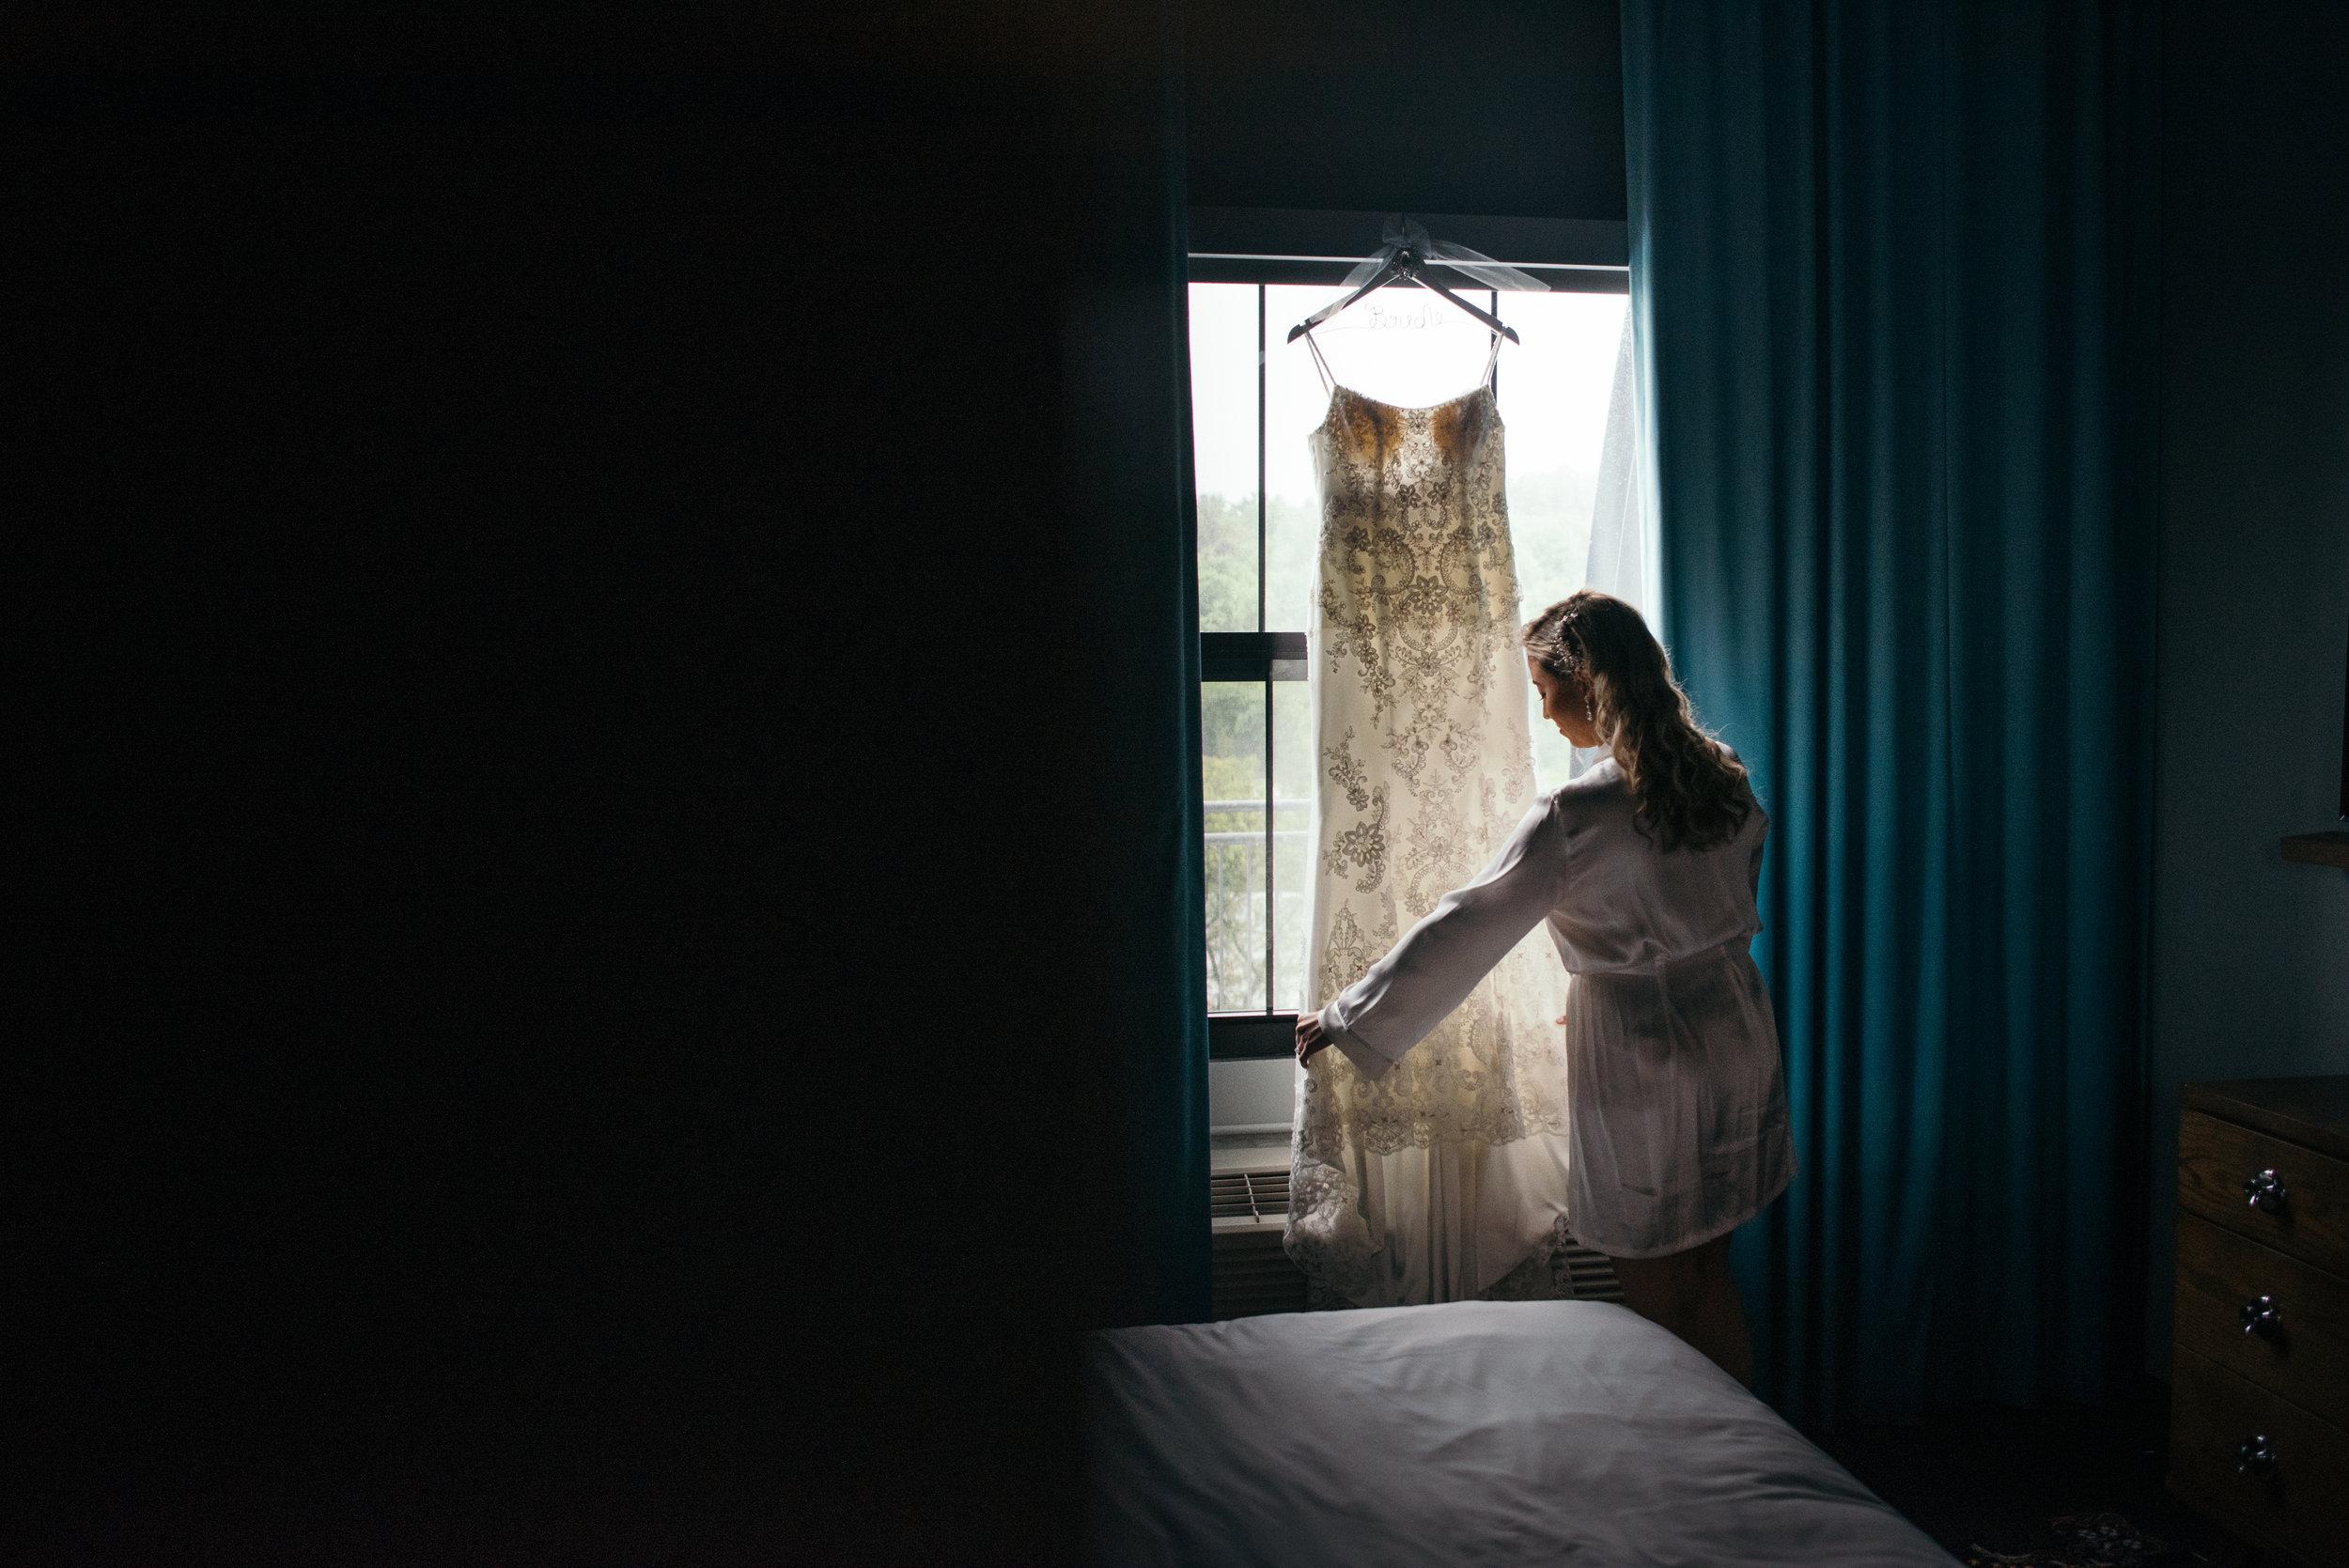 WeddingPhotos | NJPhotographer | Highlights-4-4.jpg